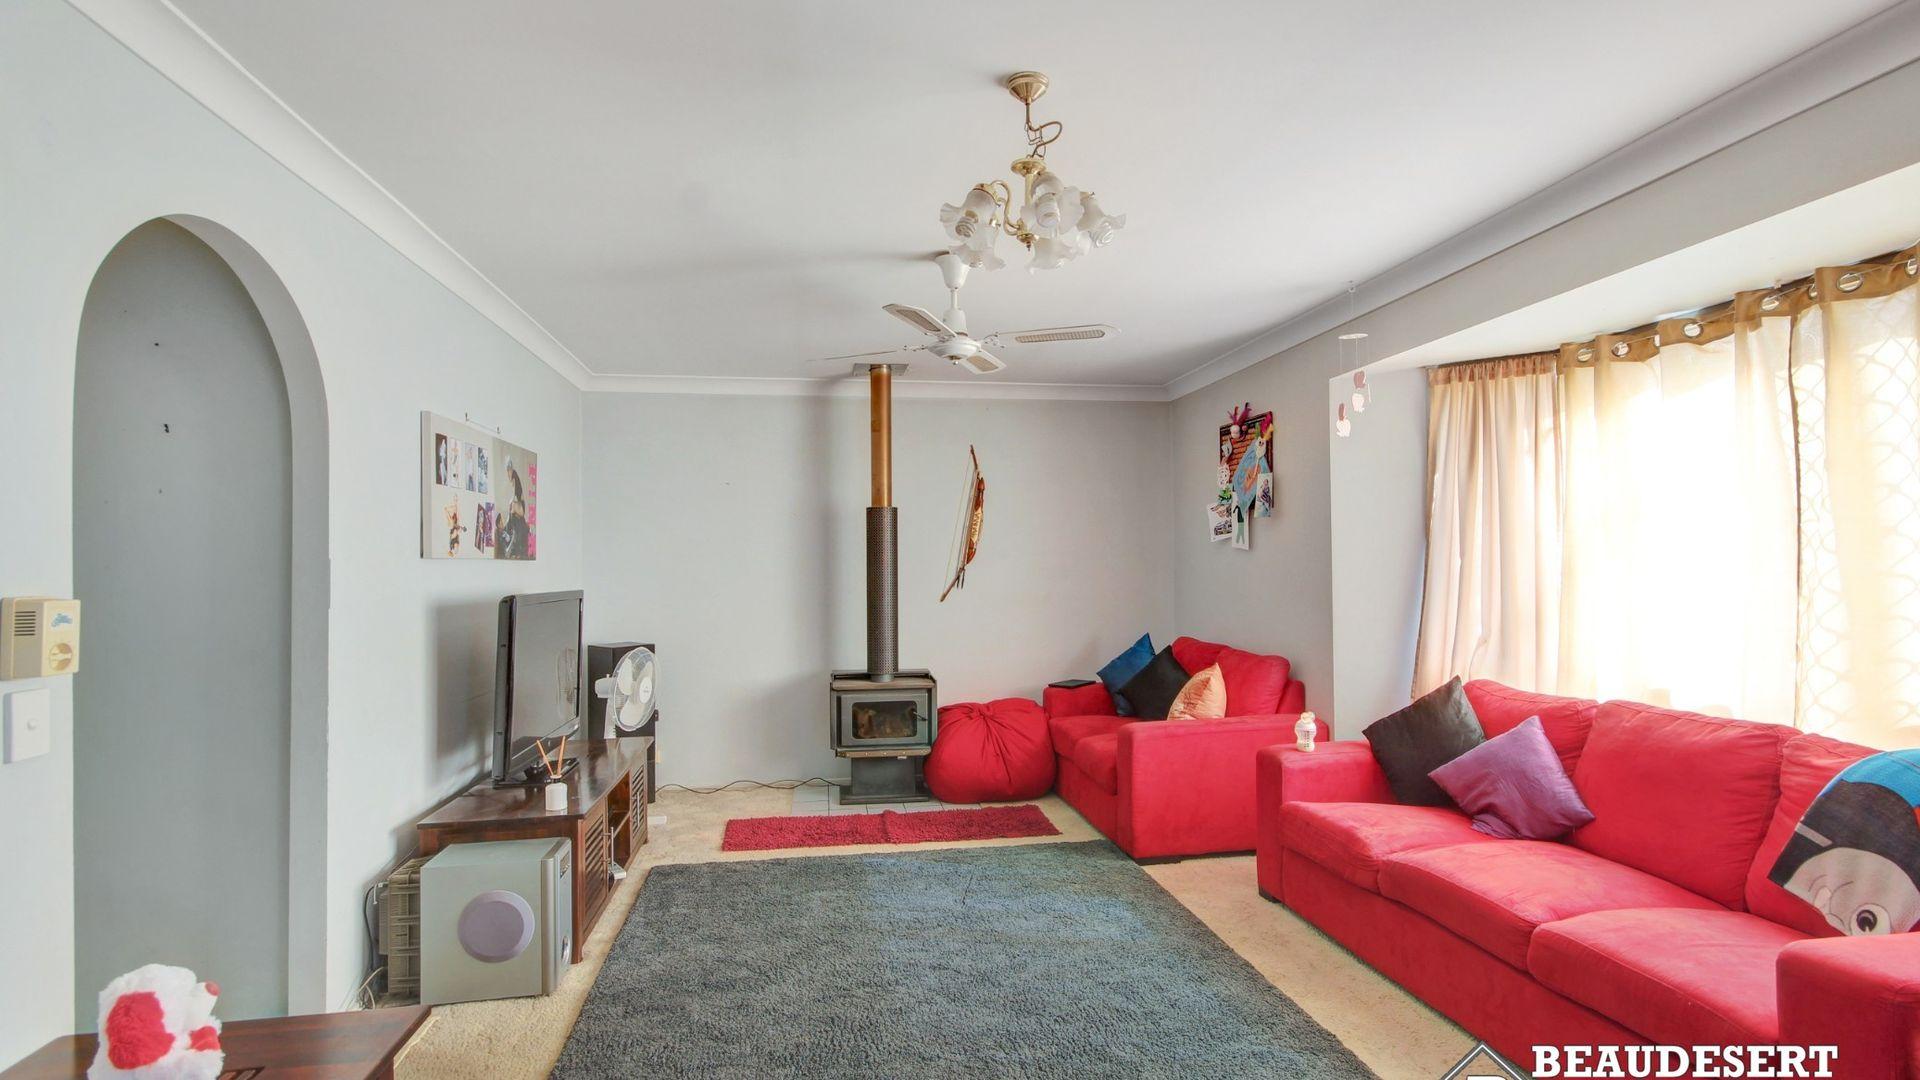 Cnr 1 Short & Merton Street, Jimboomba QLD 4280, Image 1